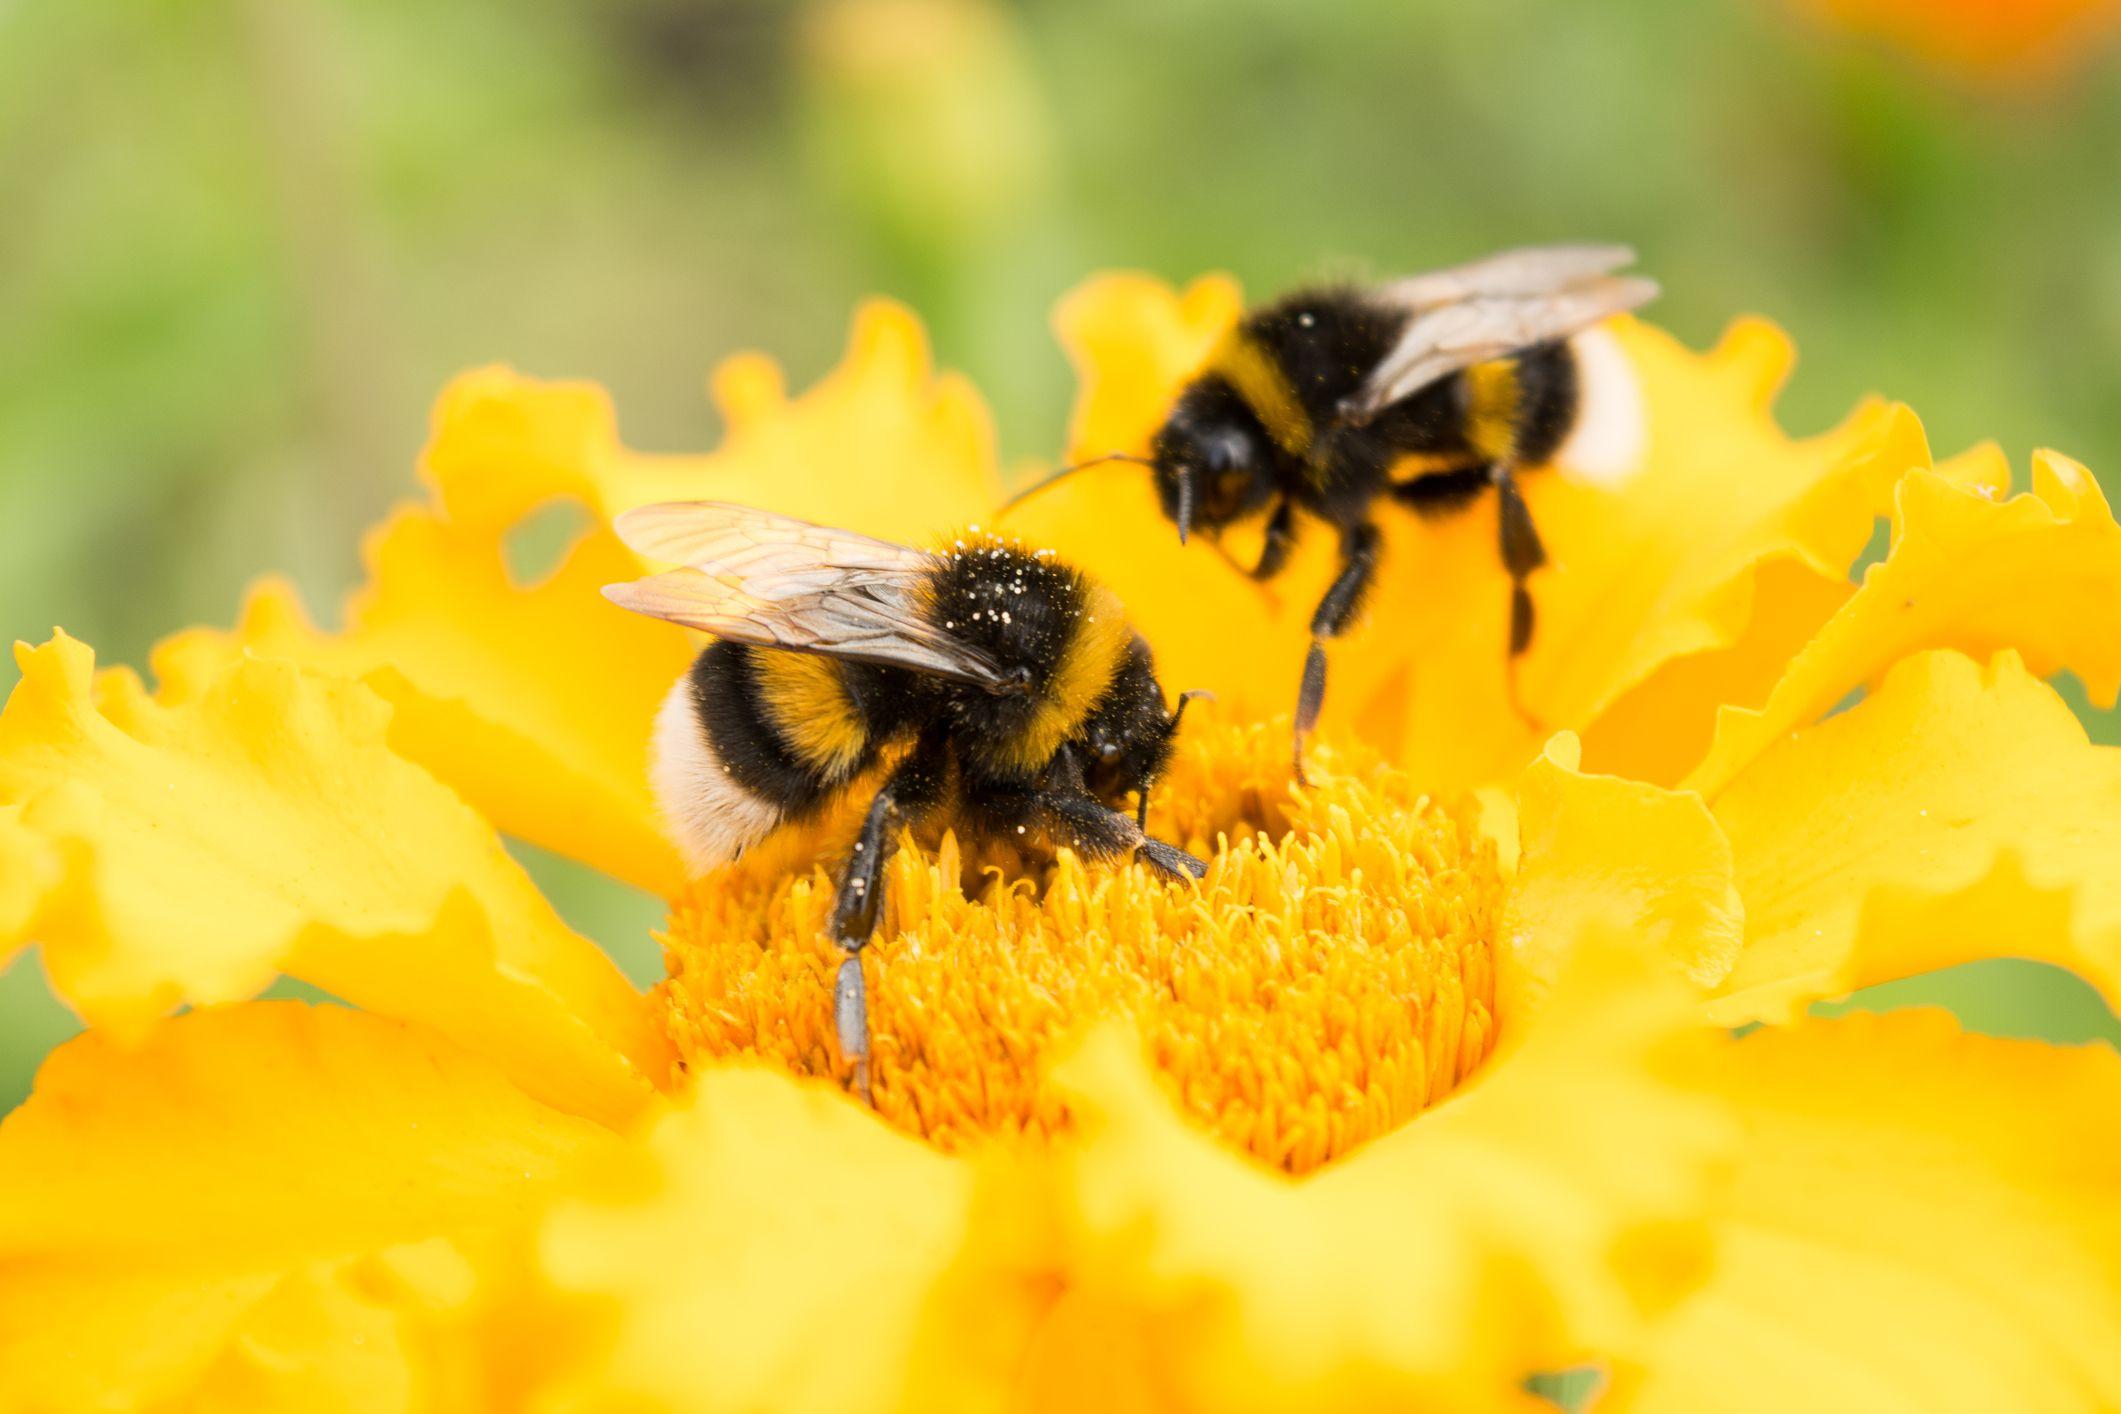 Bee Death: Scientists Warn Common Weed Killer Glyphosate ... - photo#42